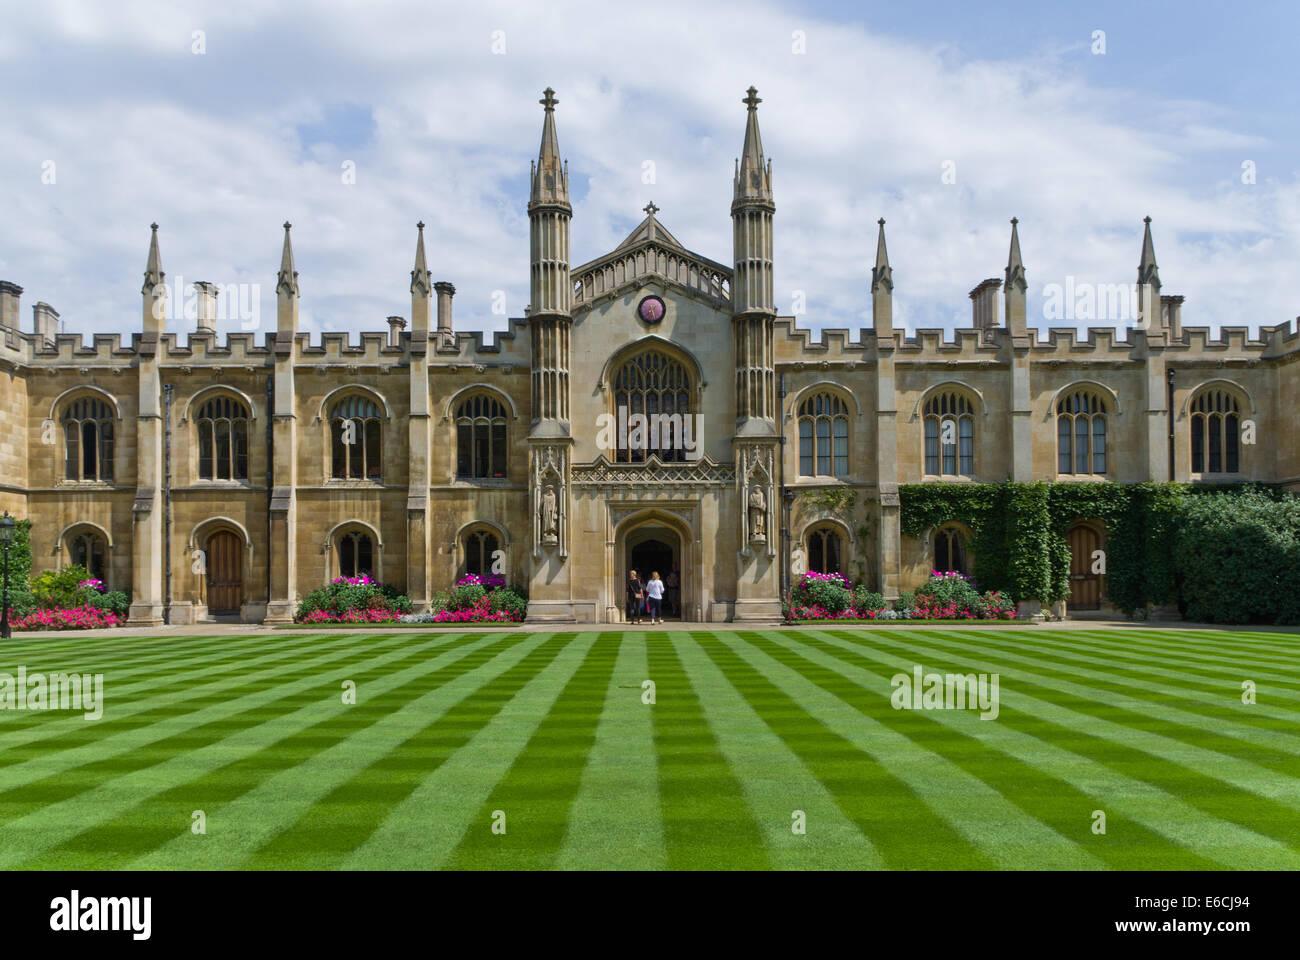 New Court, Corpus Christi College, Cambridge, UK - Stock Image